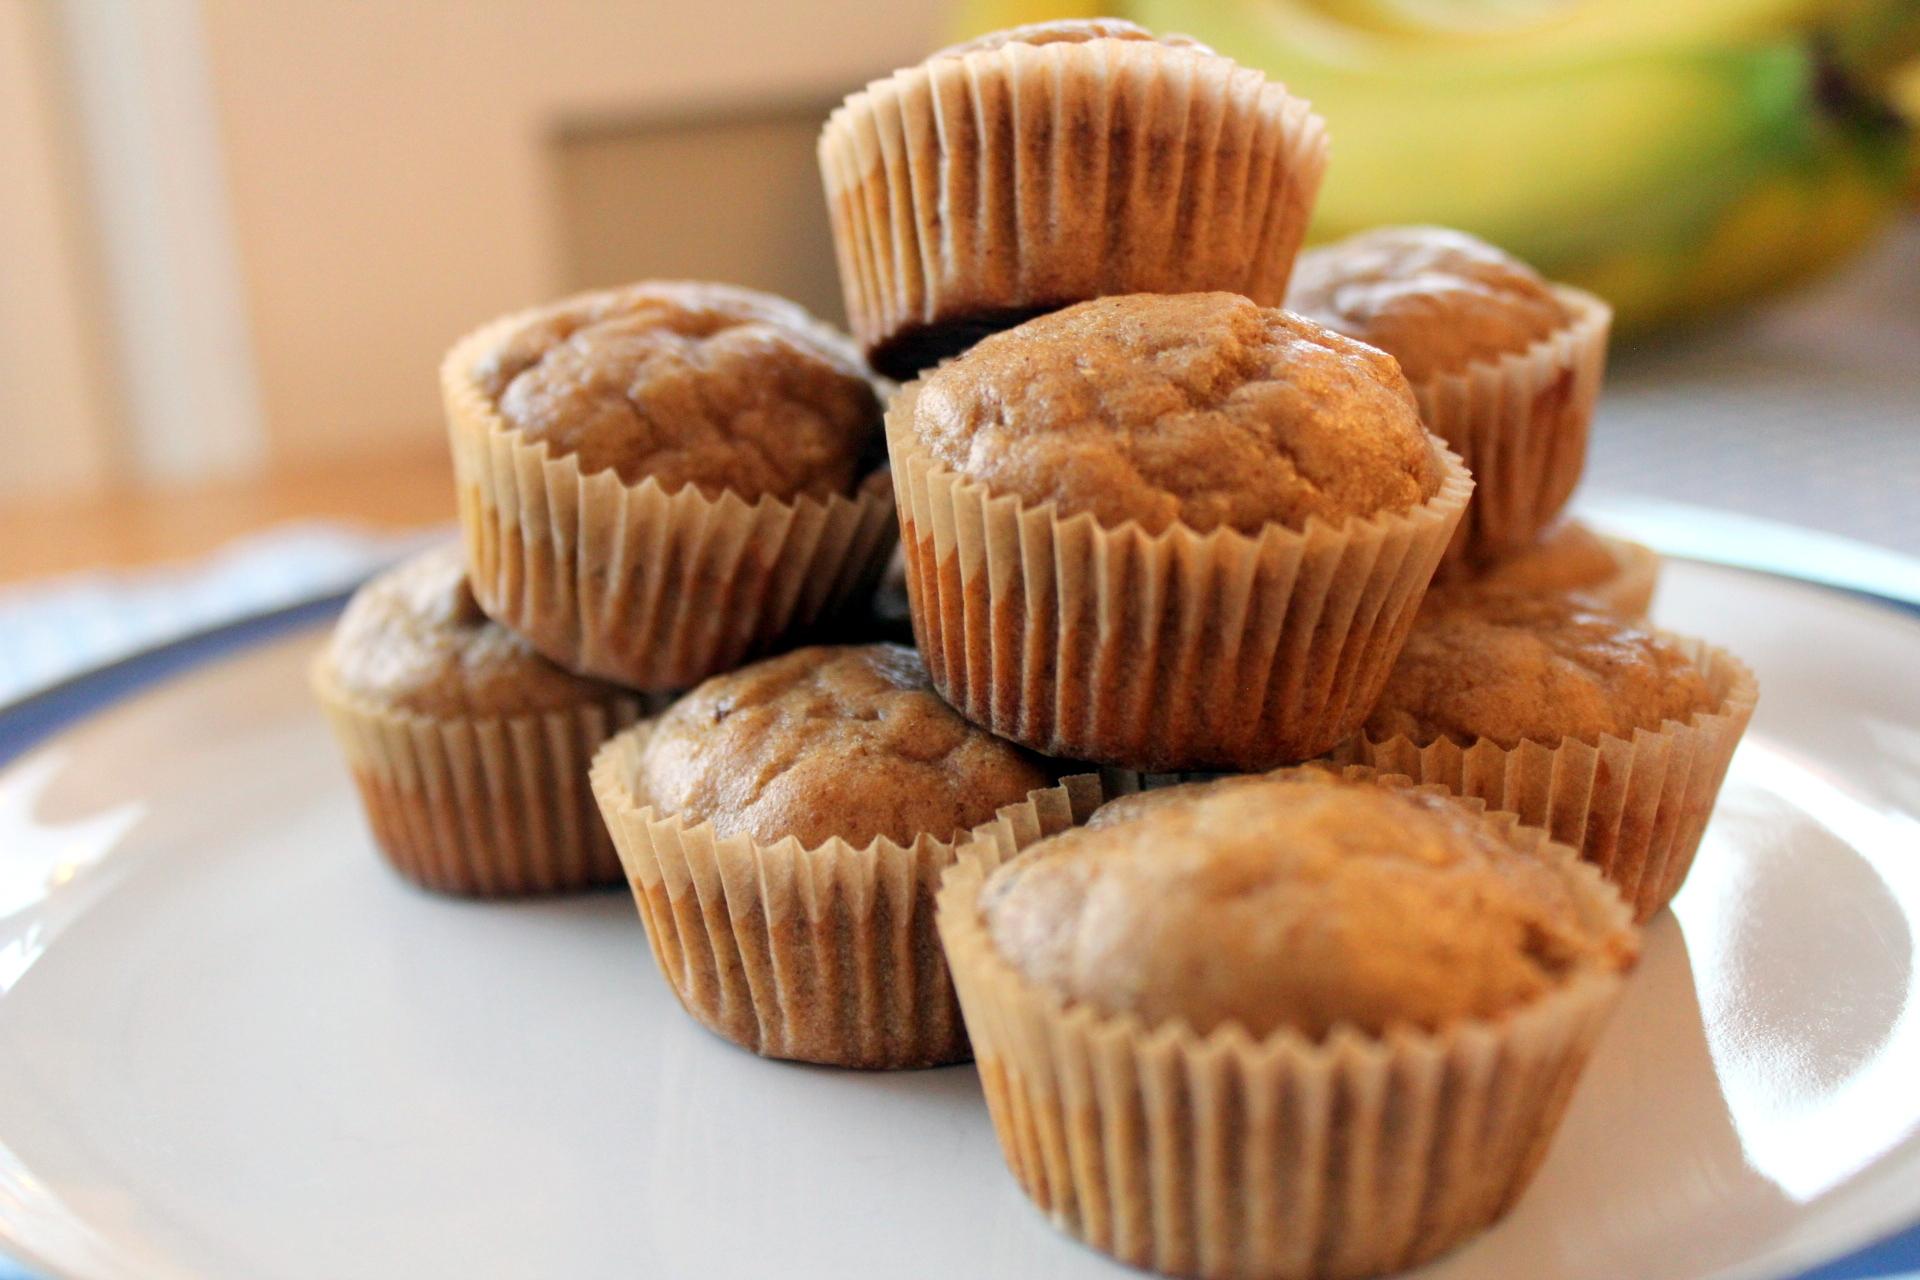 Peanut Butter Banana Mini Muffins (GAPS legal)